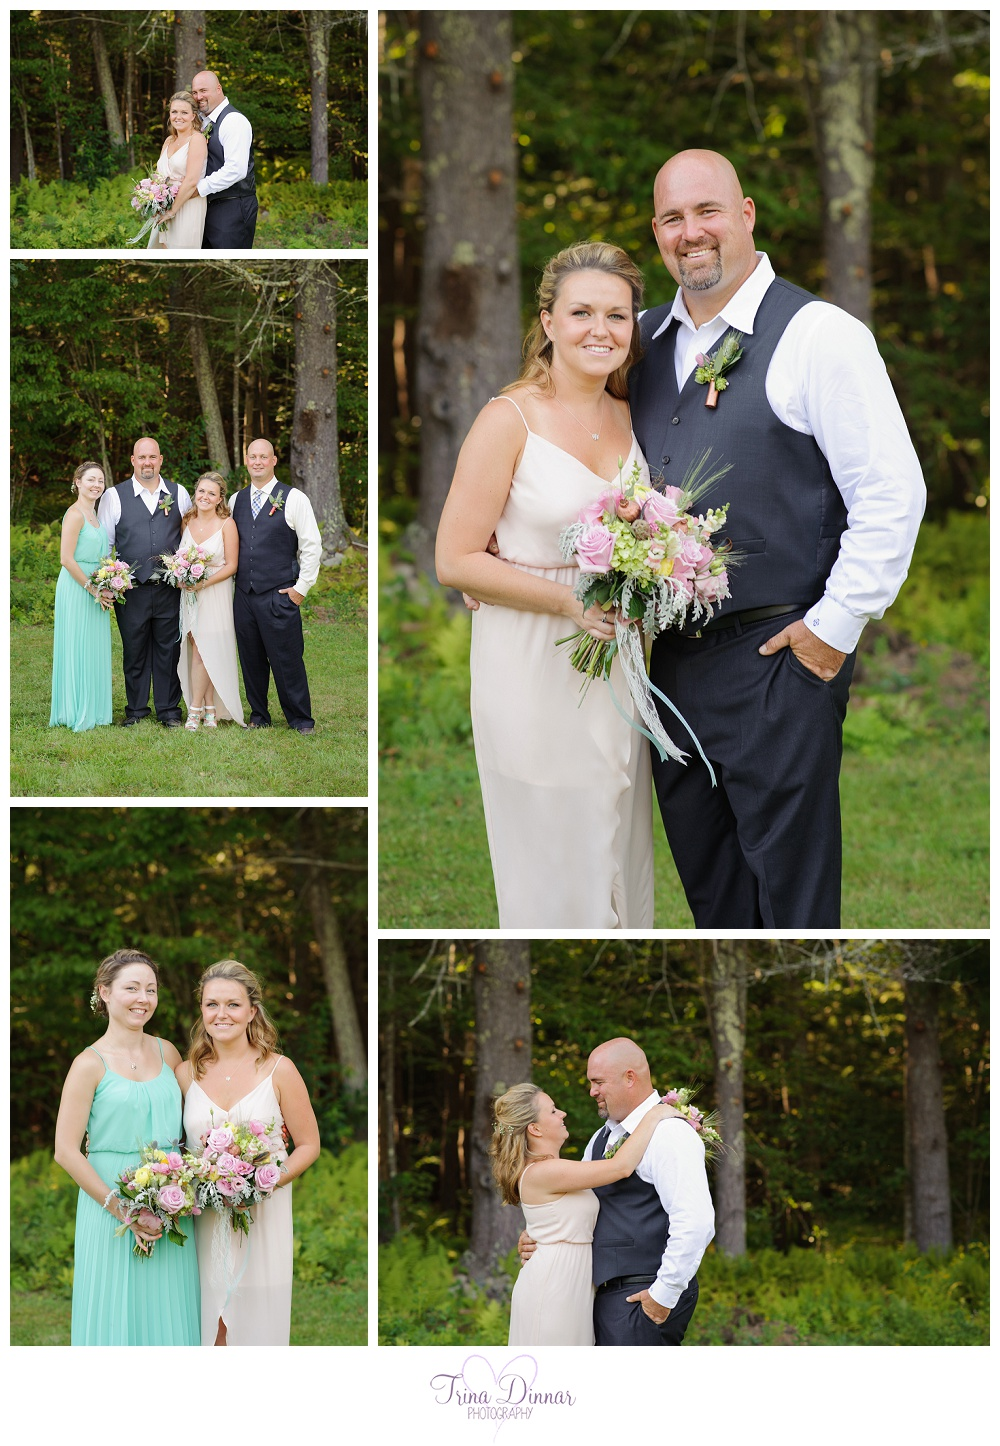 Wedding Photography in South Berwick, Maine